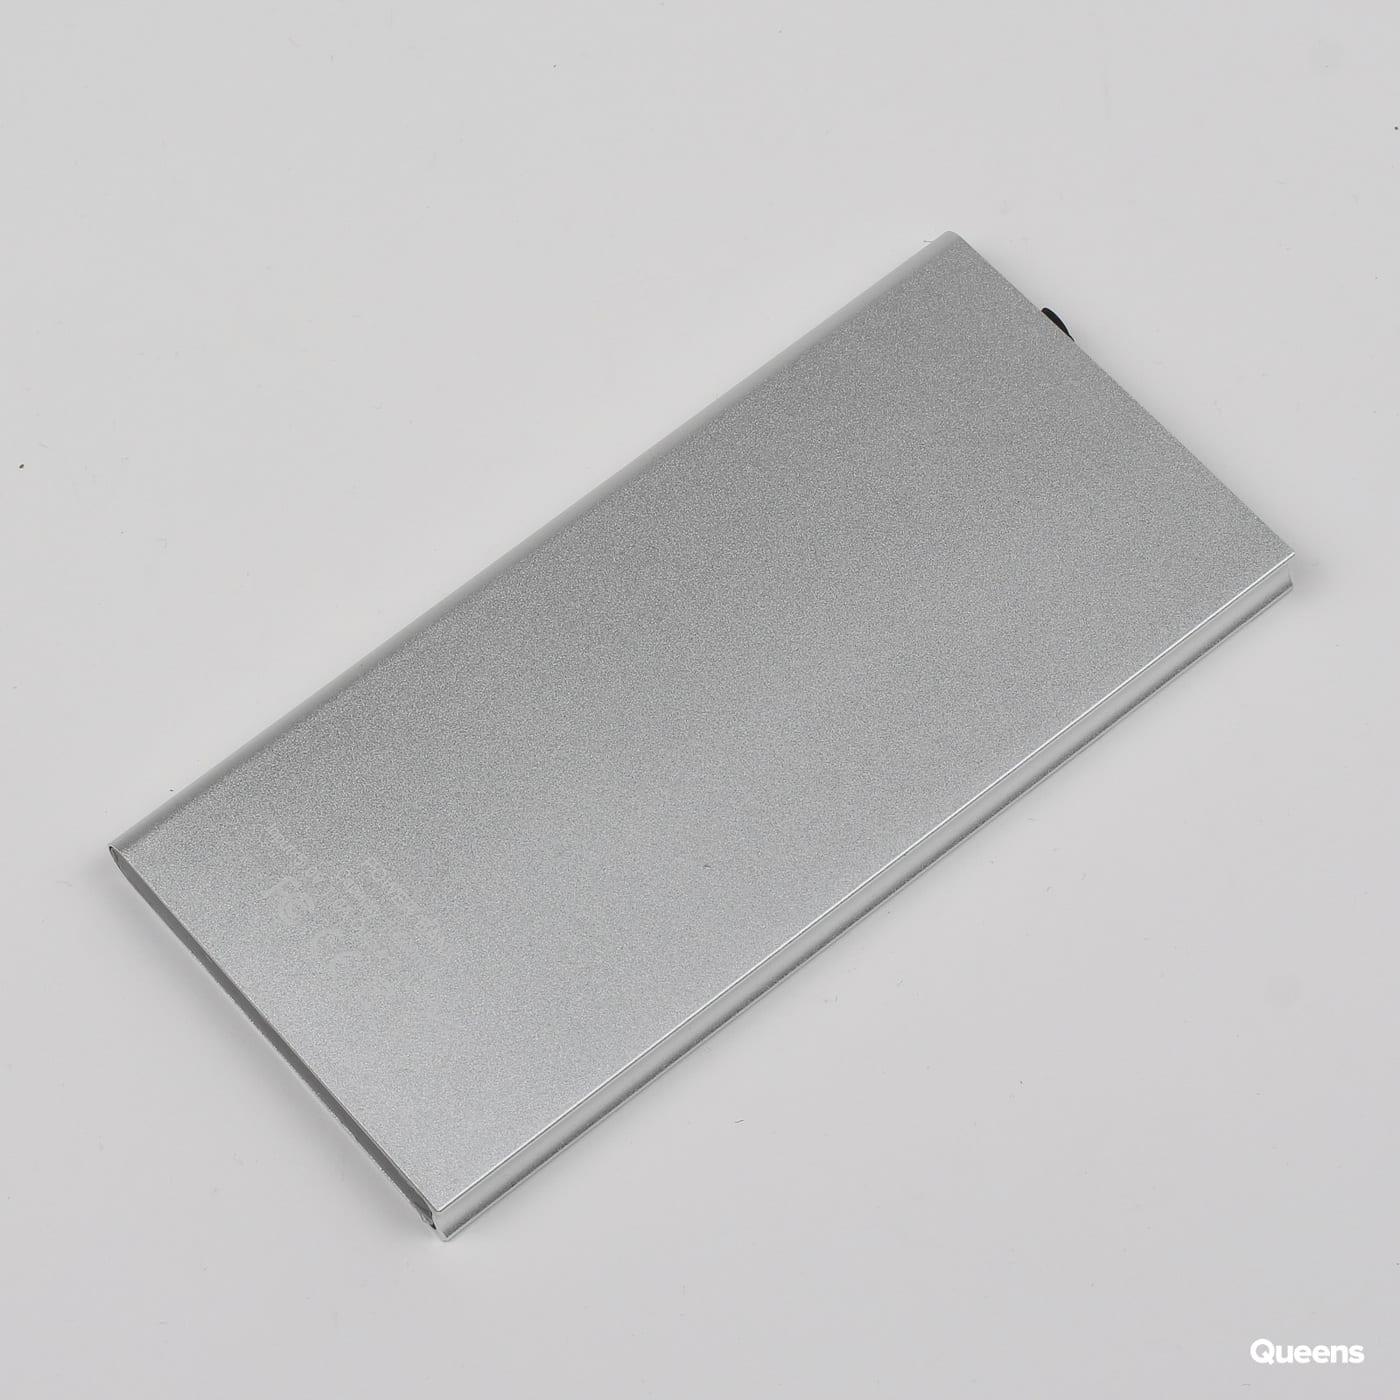 Queens Power Bank Elegance 10000 mAh Silber